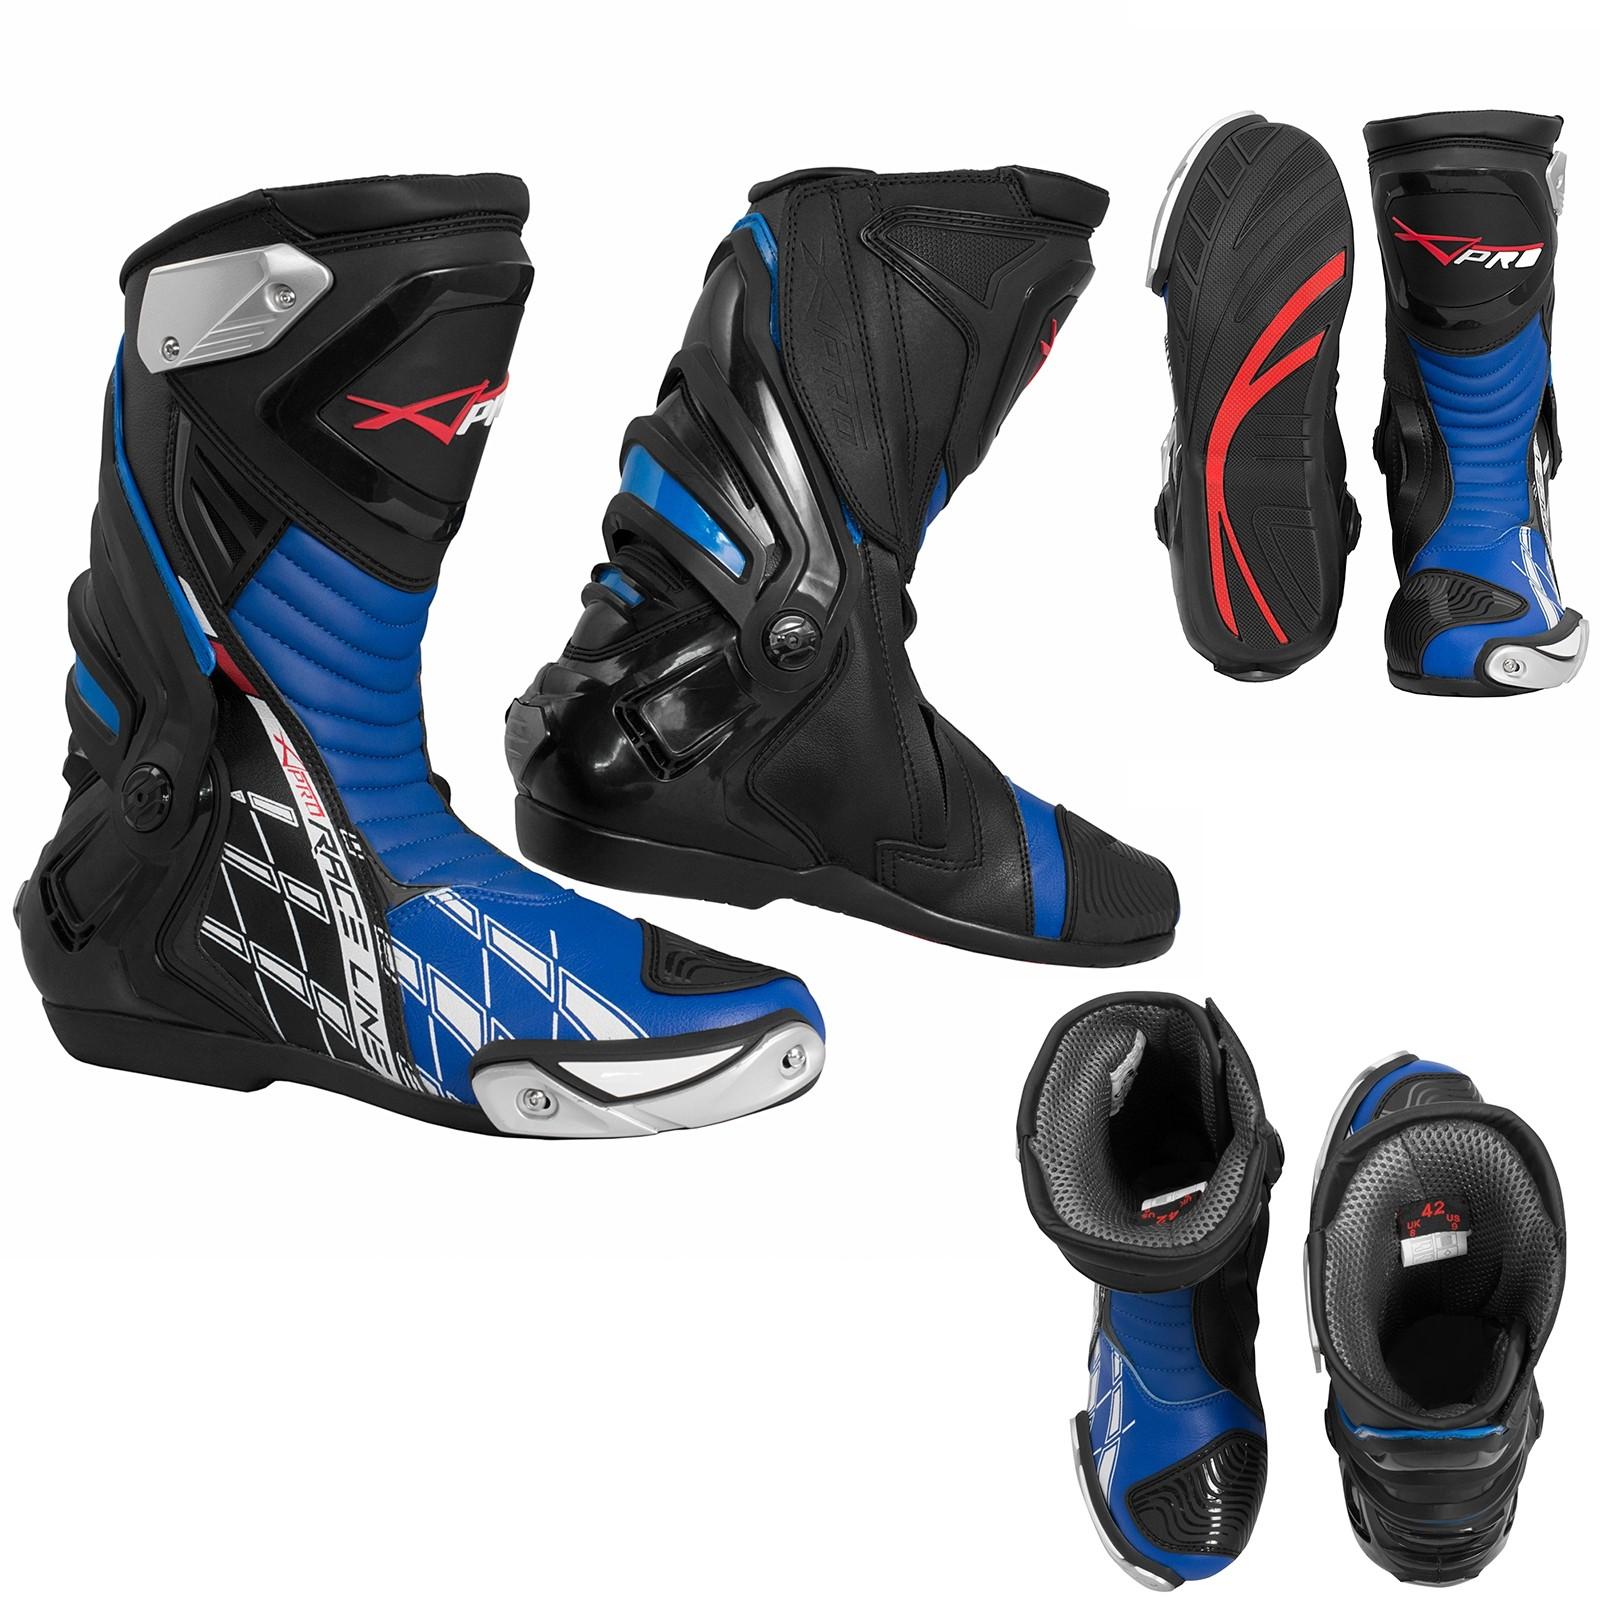 Supertech-Boots-Stivali-Motorcycle-Blue-Blu-Sonic-Moto-A-Pro-Set